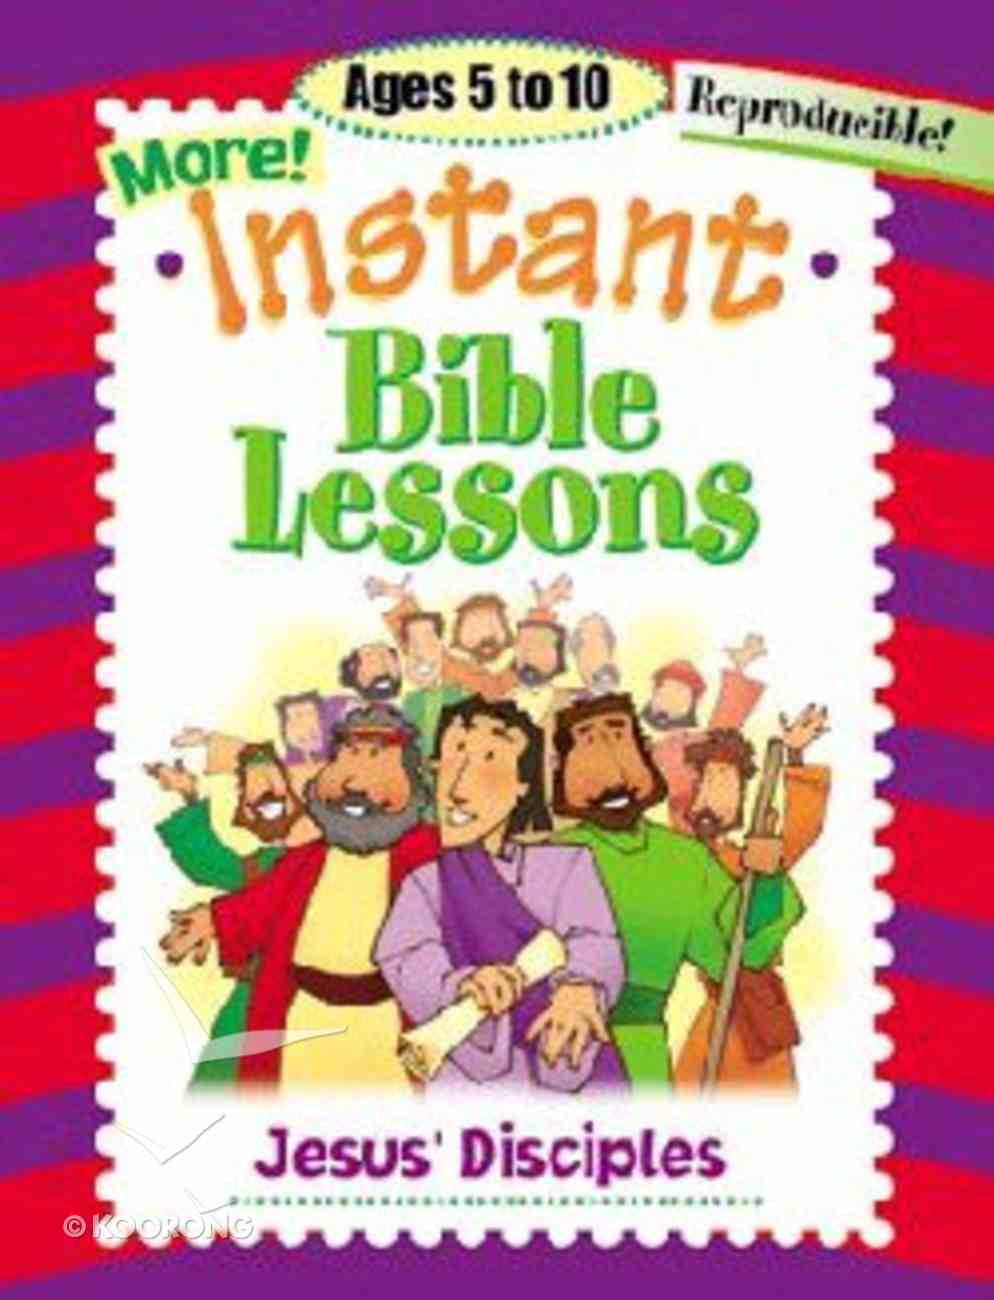 Jesus Disciples (Reproducible) (Instant Bible Lessons Series) Paperback